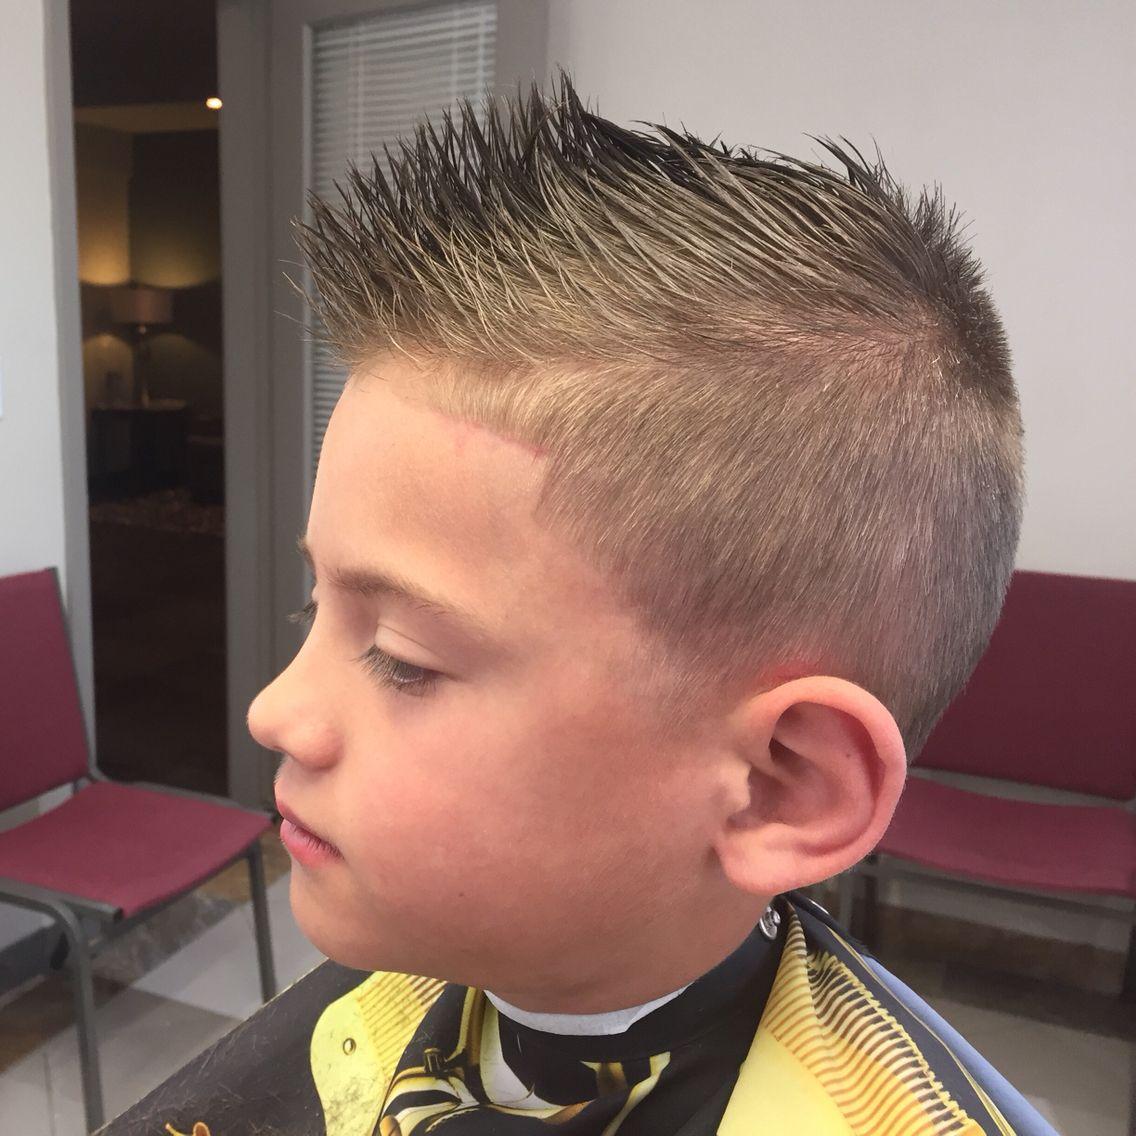 Fohawk Haircut Kidshairstyle Barber Shears Kids Hairstyles Fohawk Haircut Barber Haircuts